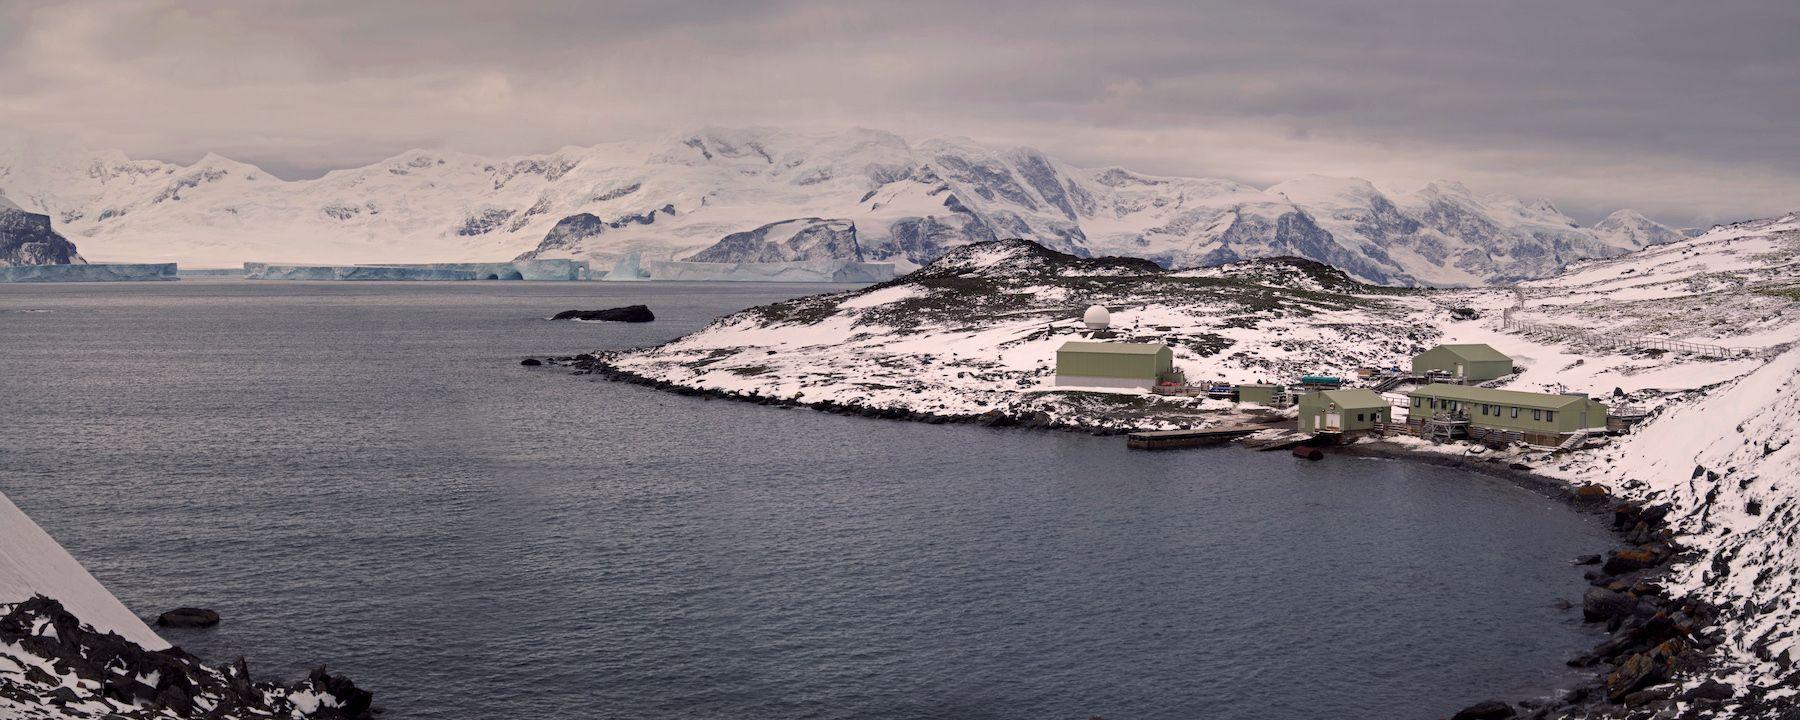 An Invasive Midge Could Wreak Havoc on Antarctica